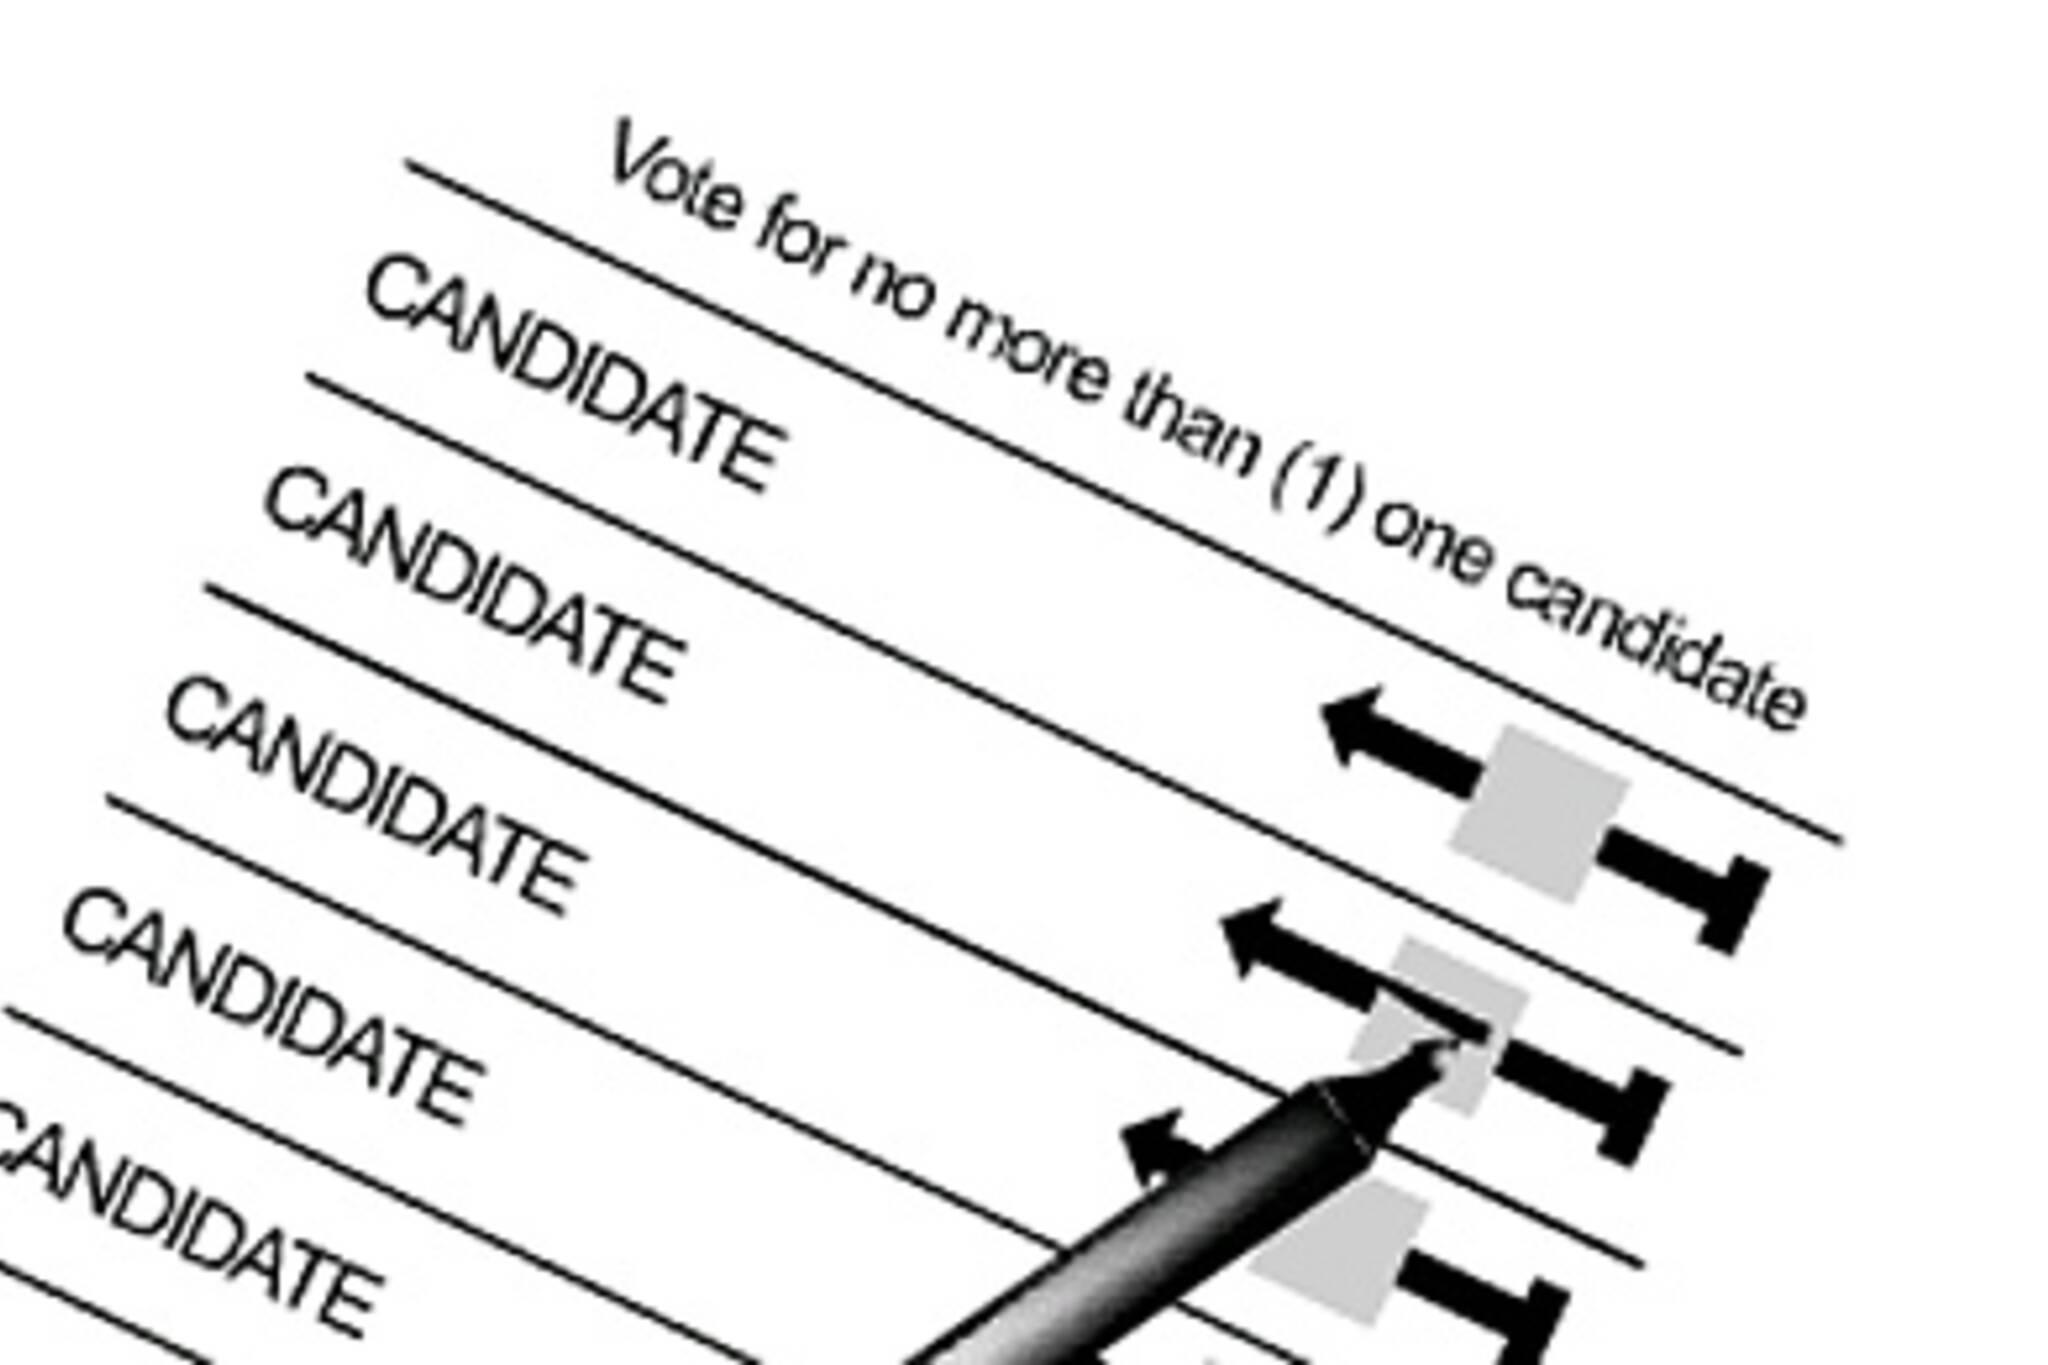 20061113_electionproblem.jpg